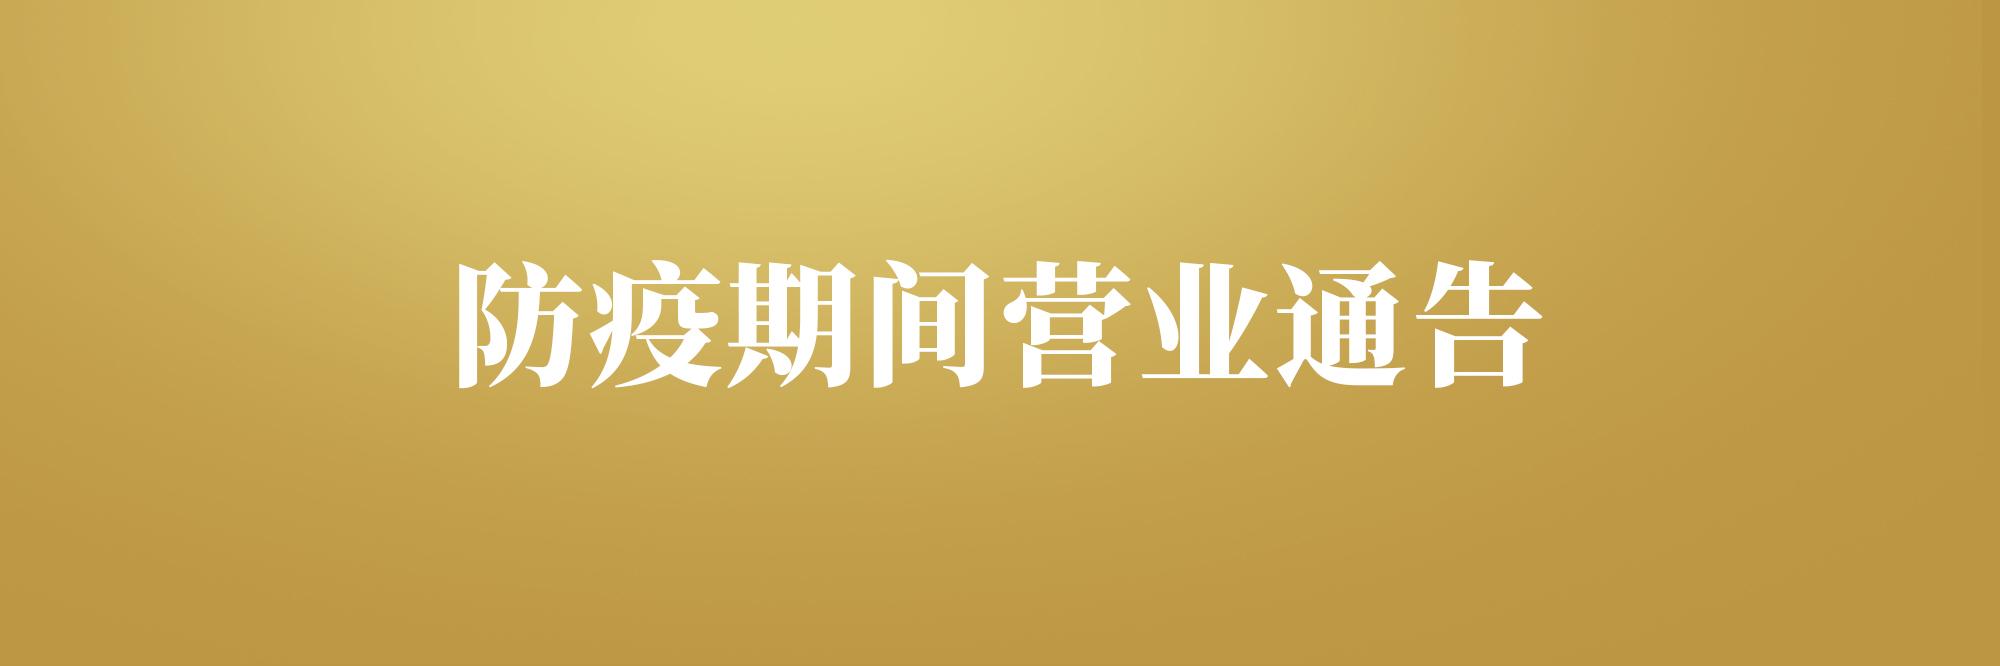 https://www.parisianmacao.com.cn/macau-hotel/promotions-offers/5th-anniversary.html https://assets.sandsresortsmacao.cn/content/parisianmacao/hotel/promotion-offers/5th-anniversary/5th-anniversary_cta-banner_2000x666_sc.jpg